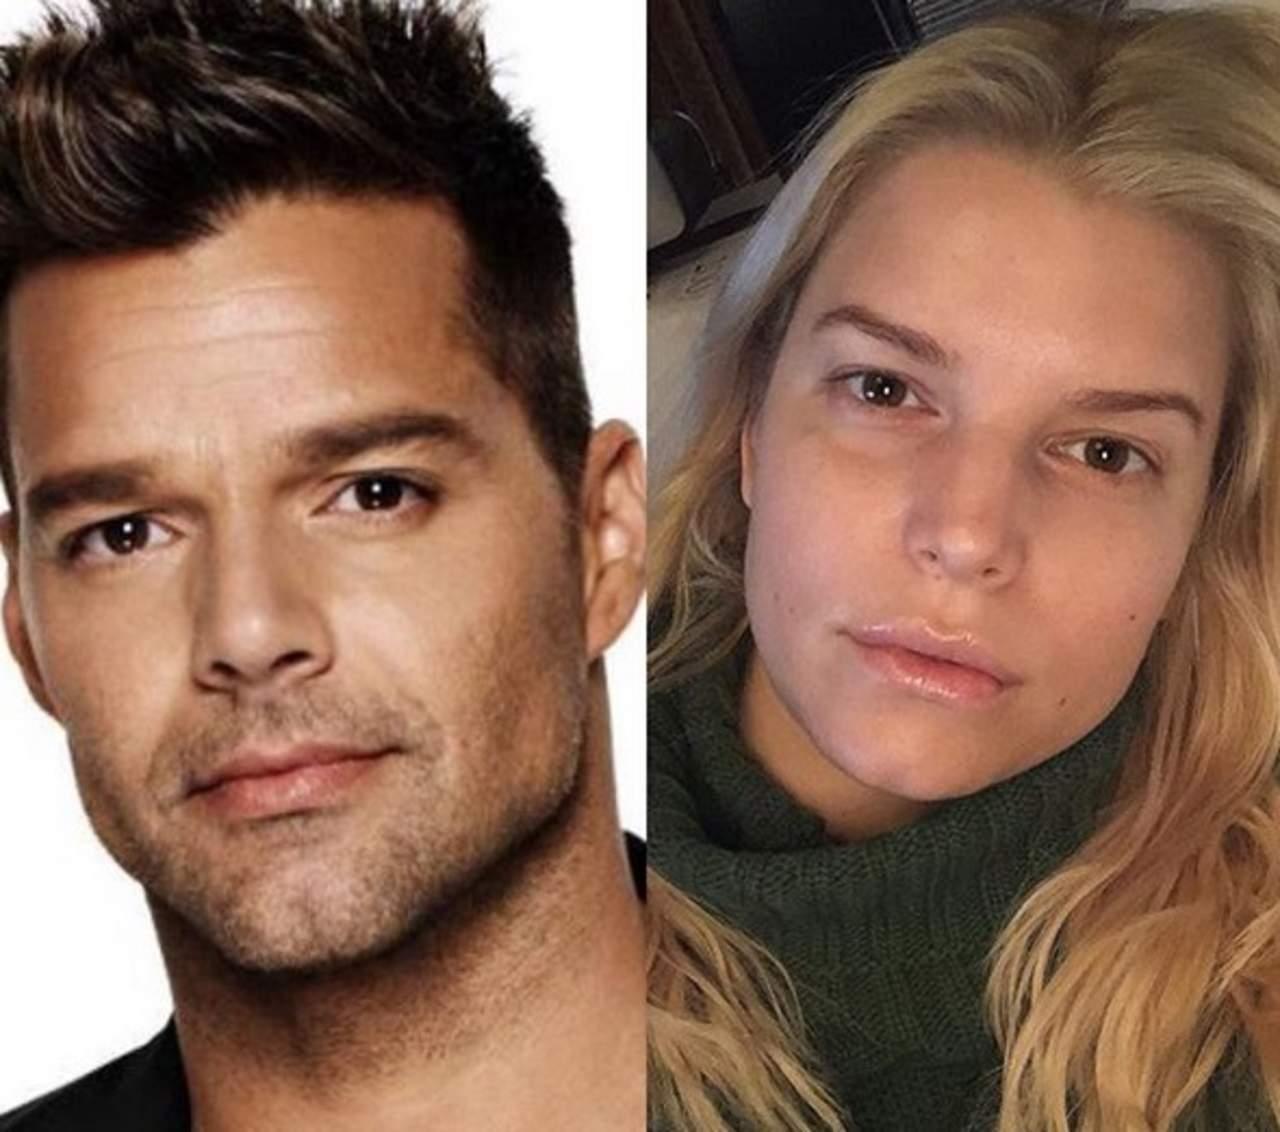 Jessica Simpson es señalada por su parecido a Ricky Martin